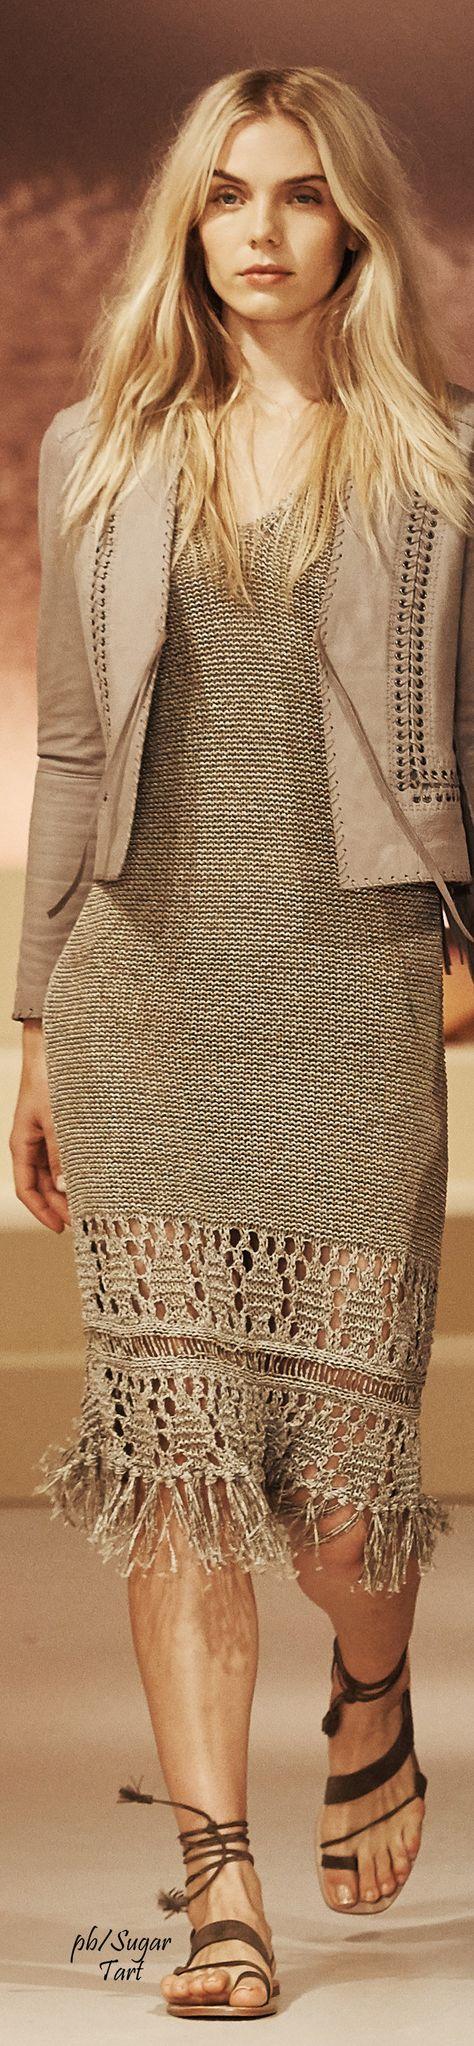 Elie Tahari Spring 2016 RTW women fashion outfit clothing style apparel @roressclothes closet ideas